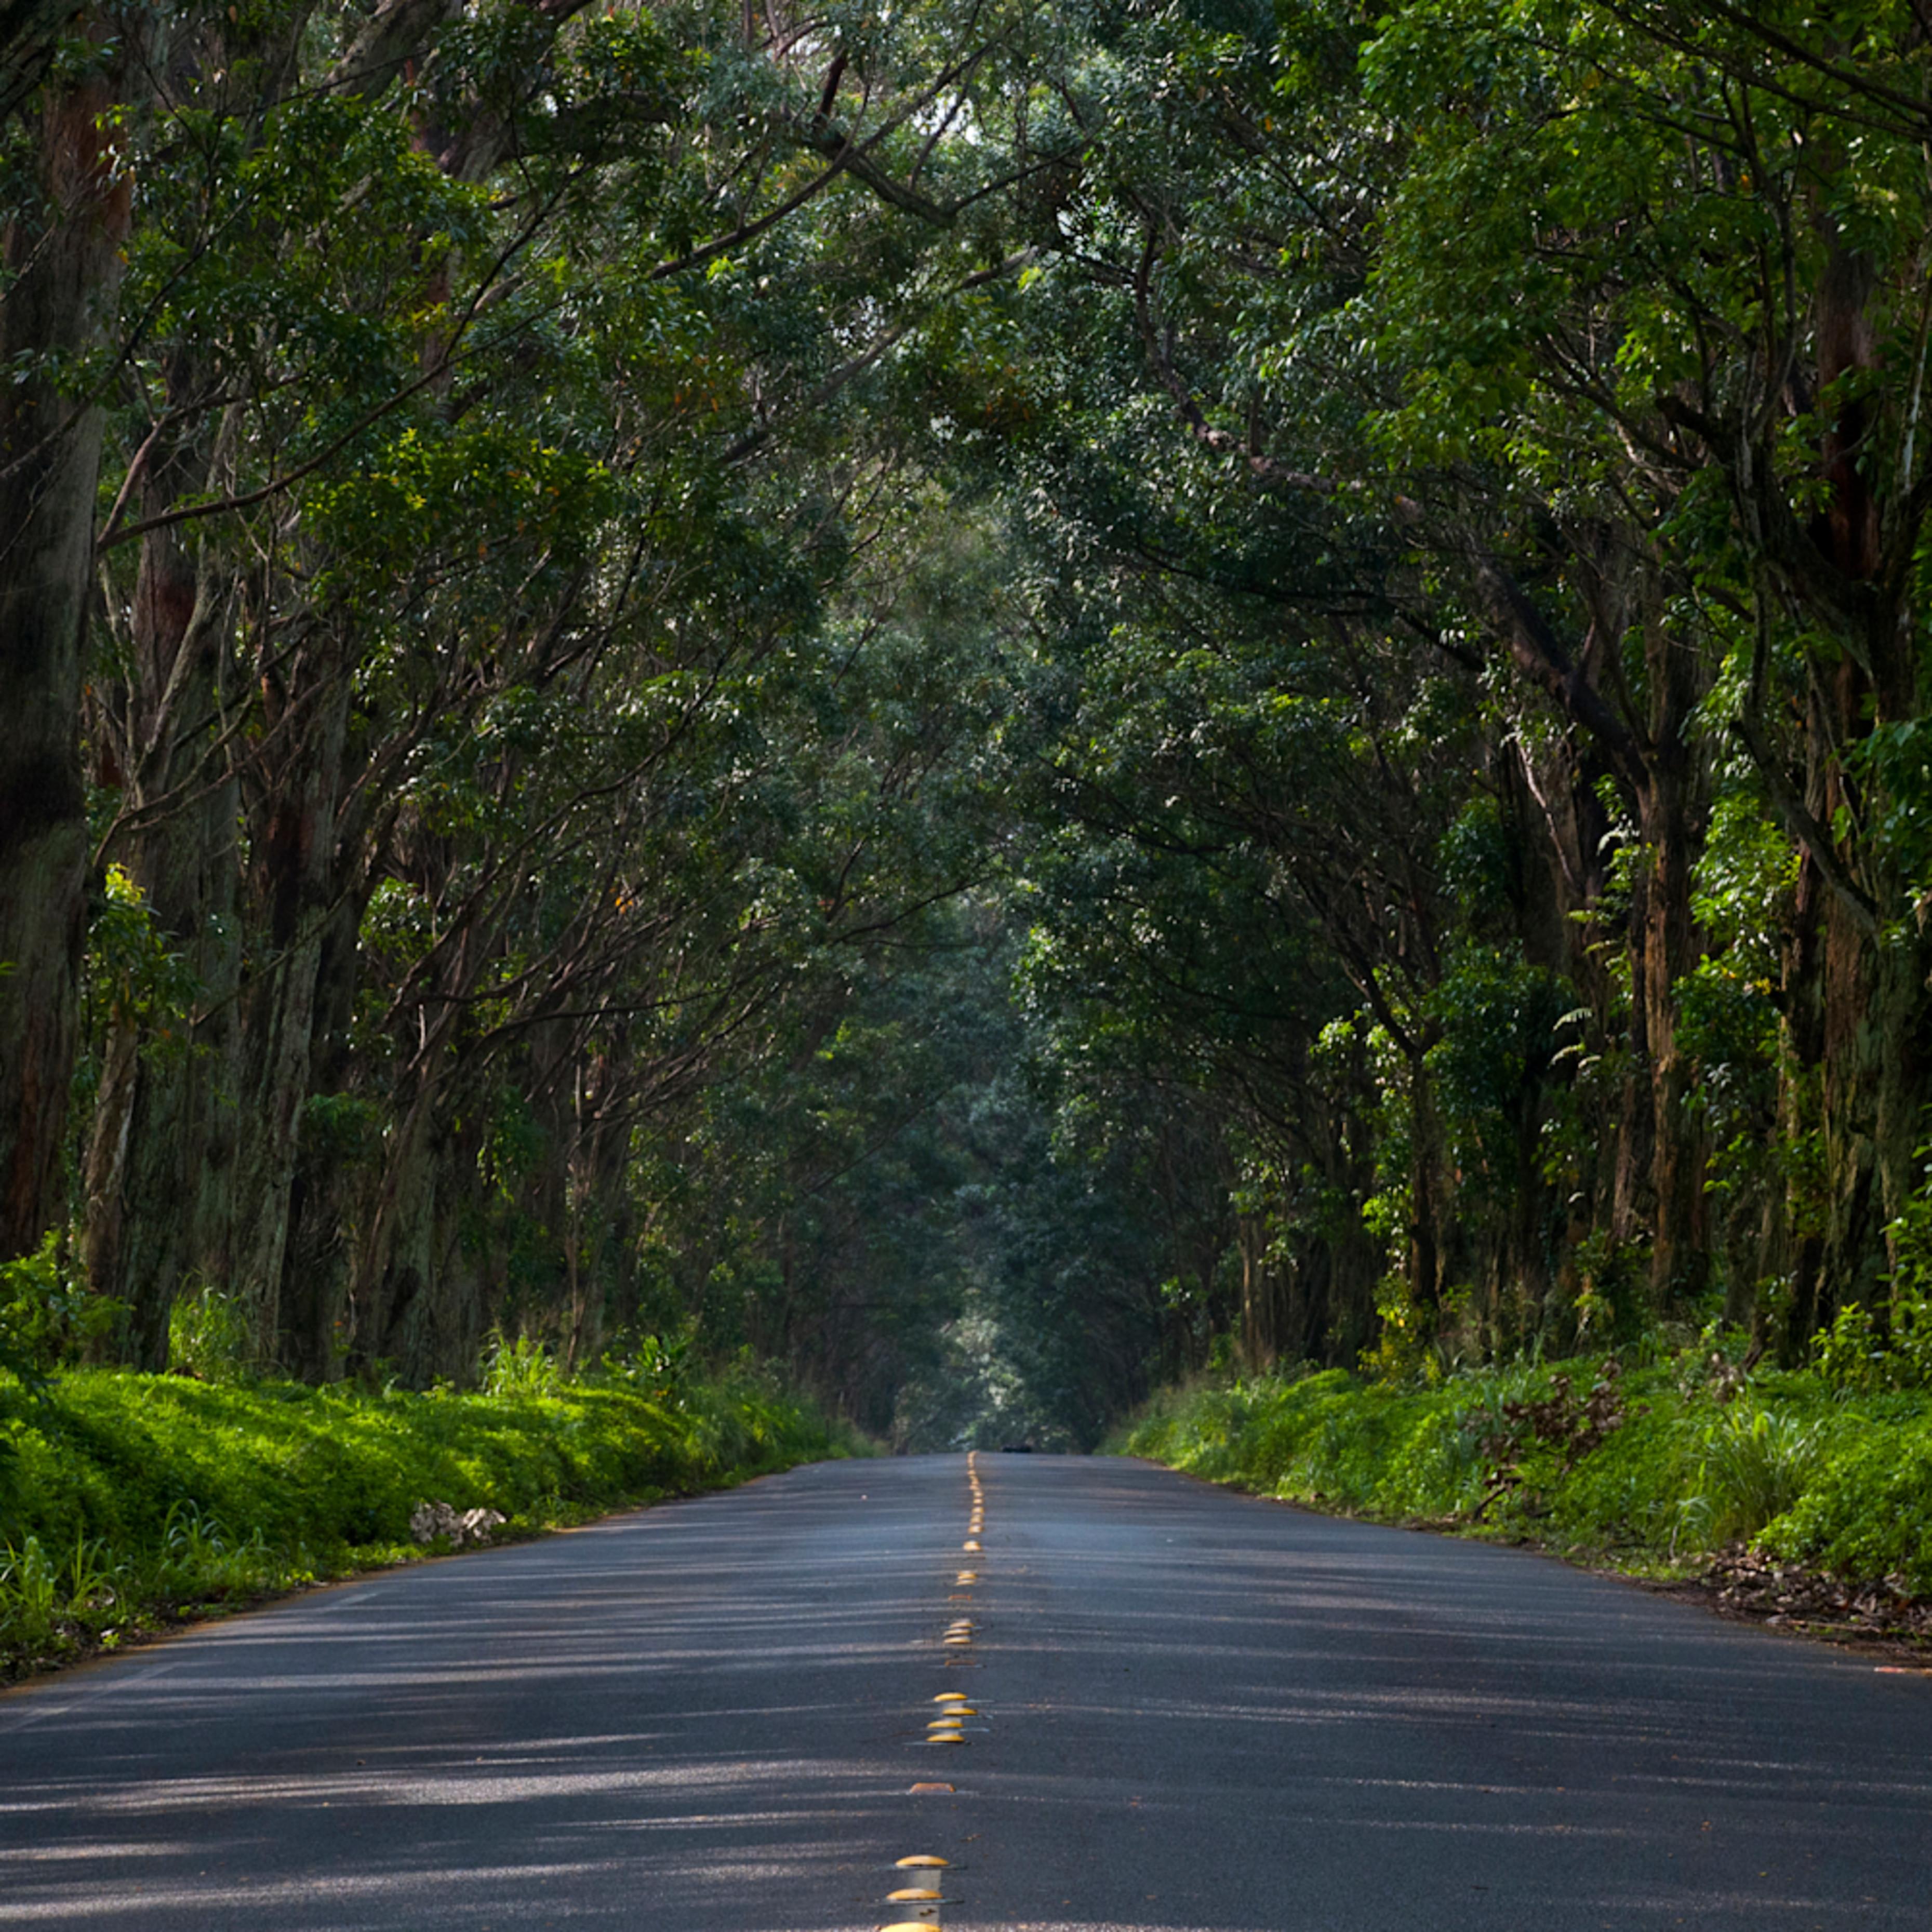 Tunnel of trees ia6vyk